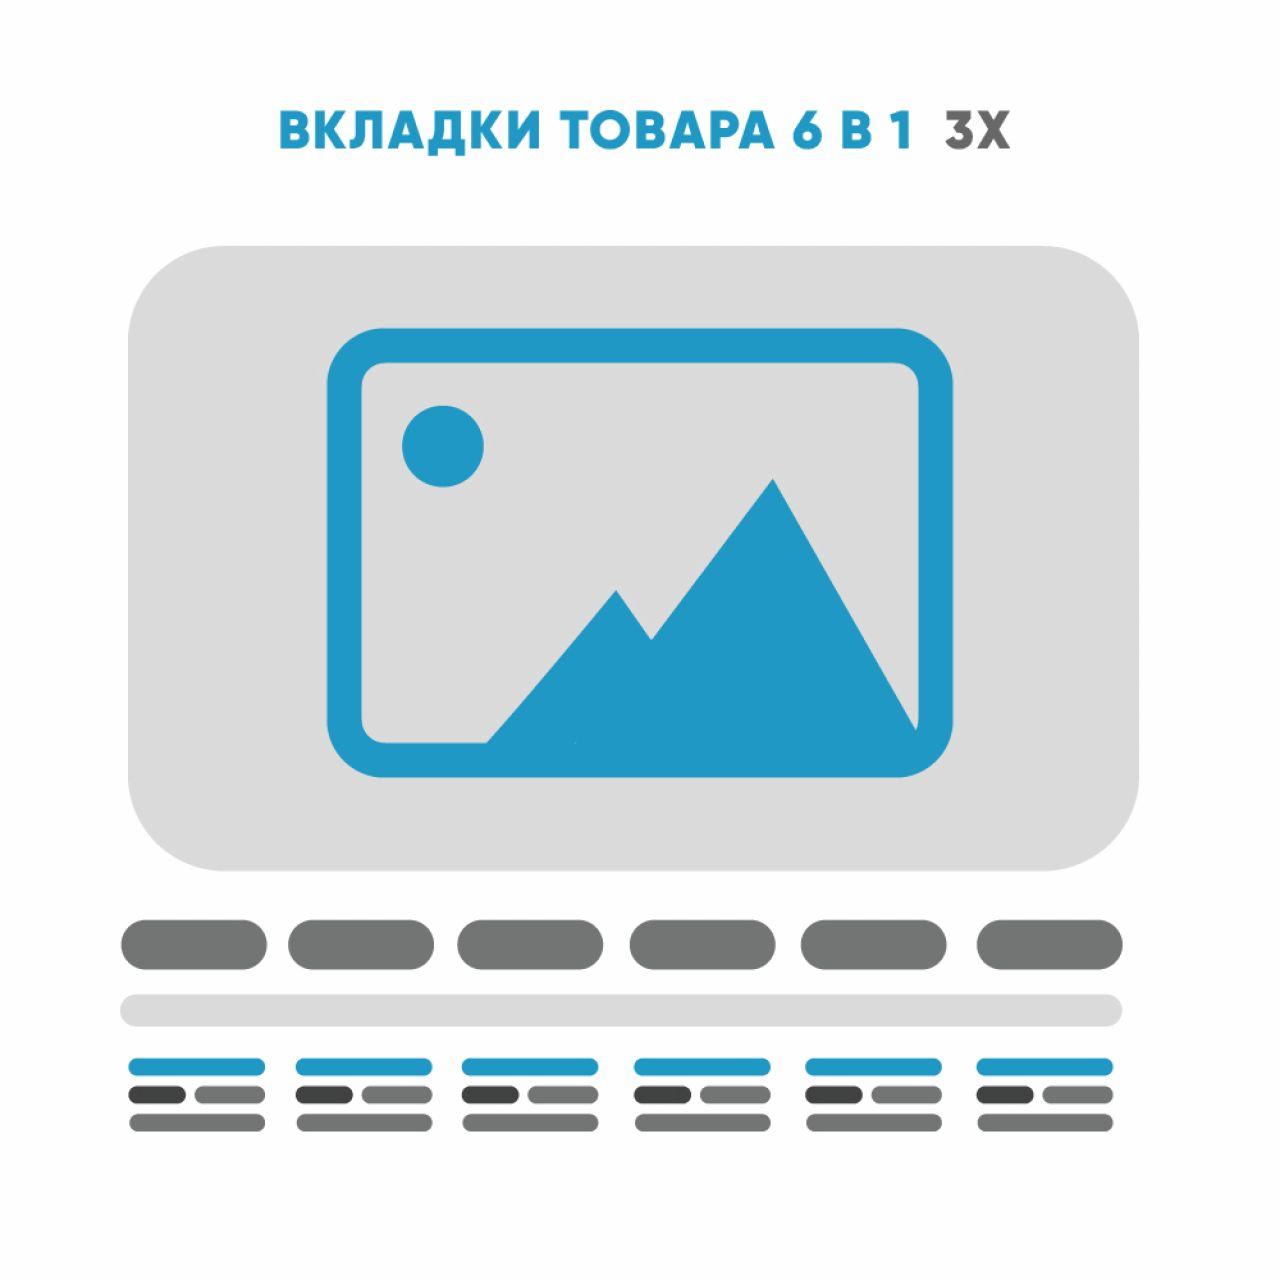 Вкладки товара 6 в 1 (Product tab's 6 in 1) 3.x из категории Оформление для CMS OpenCart (ОпенКарт)